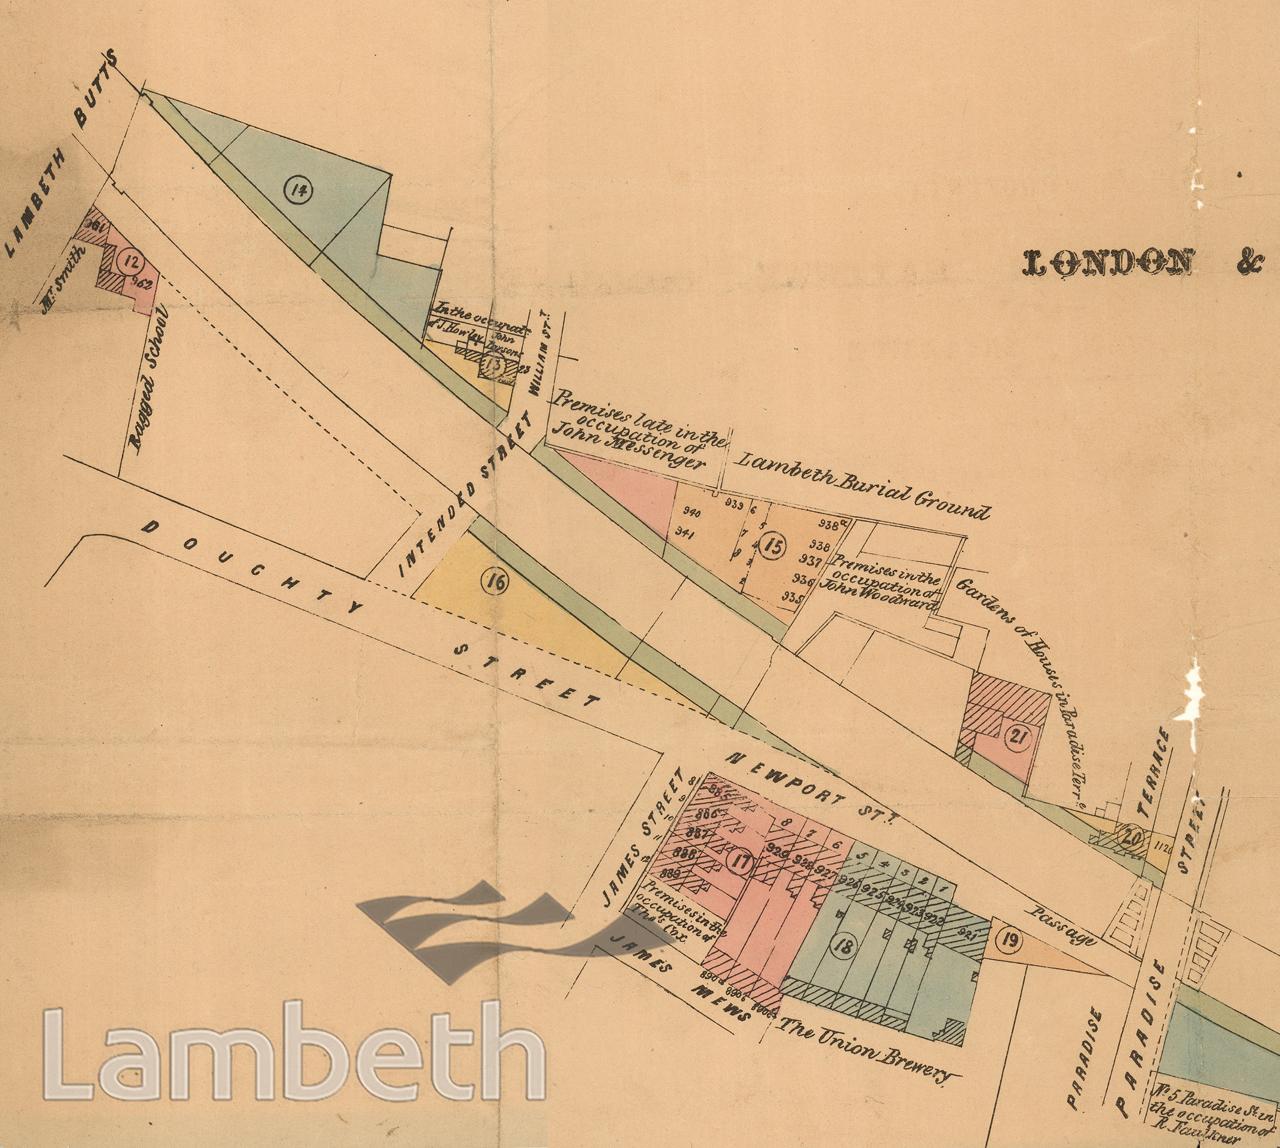 L&SW RAILWAY COMPANY AUCTION OF SURPLUS LAMBETH PROPERTIES